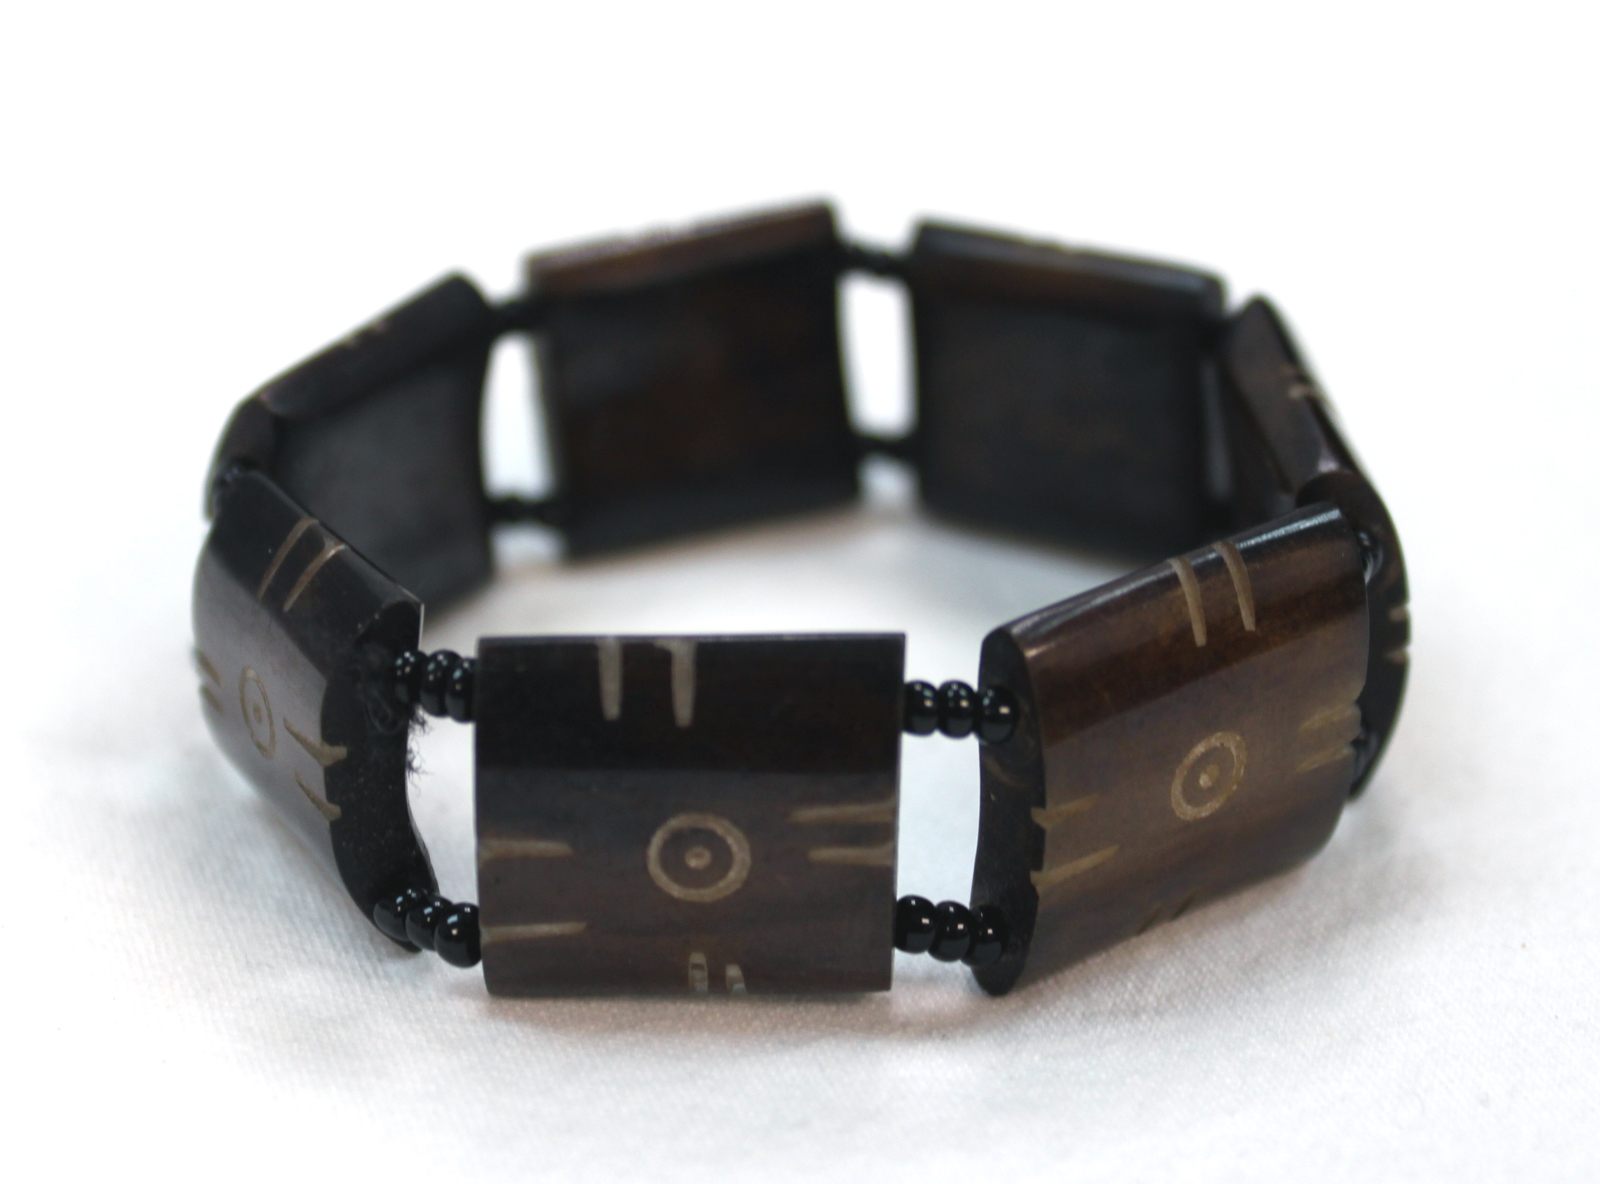 Studio 55 jewellery from Africa